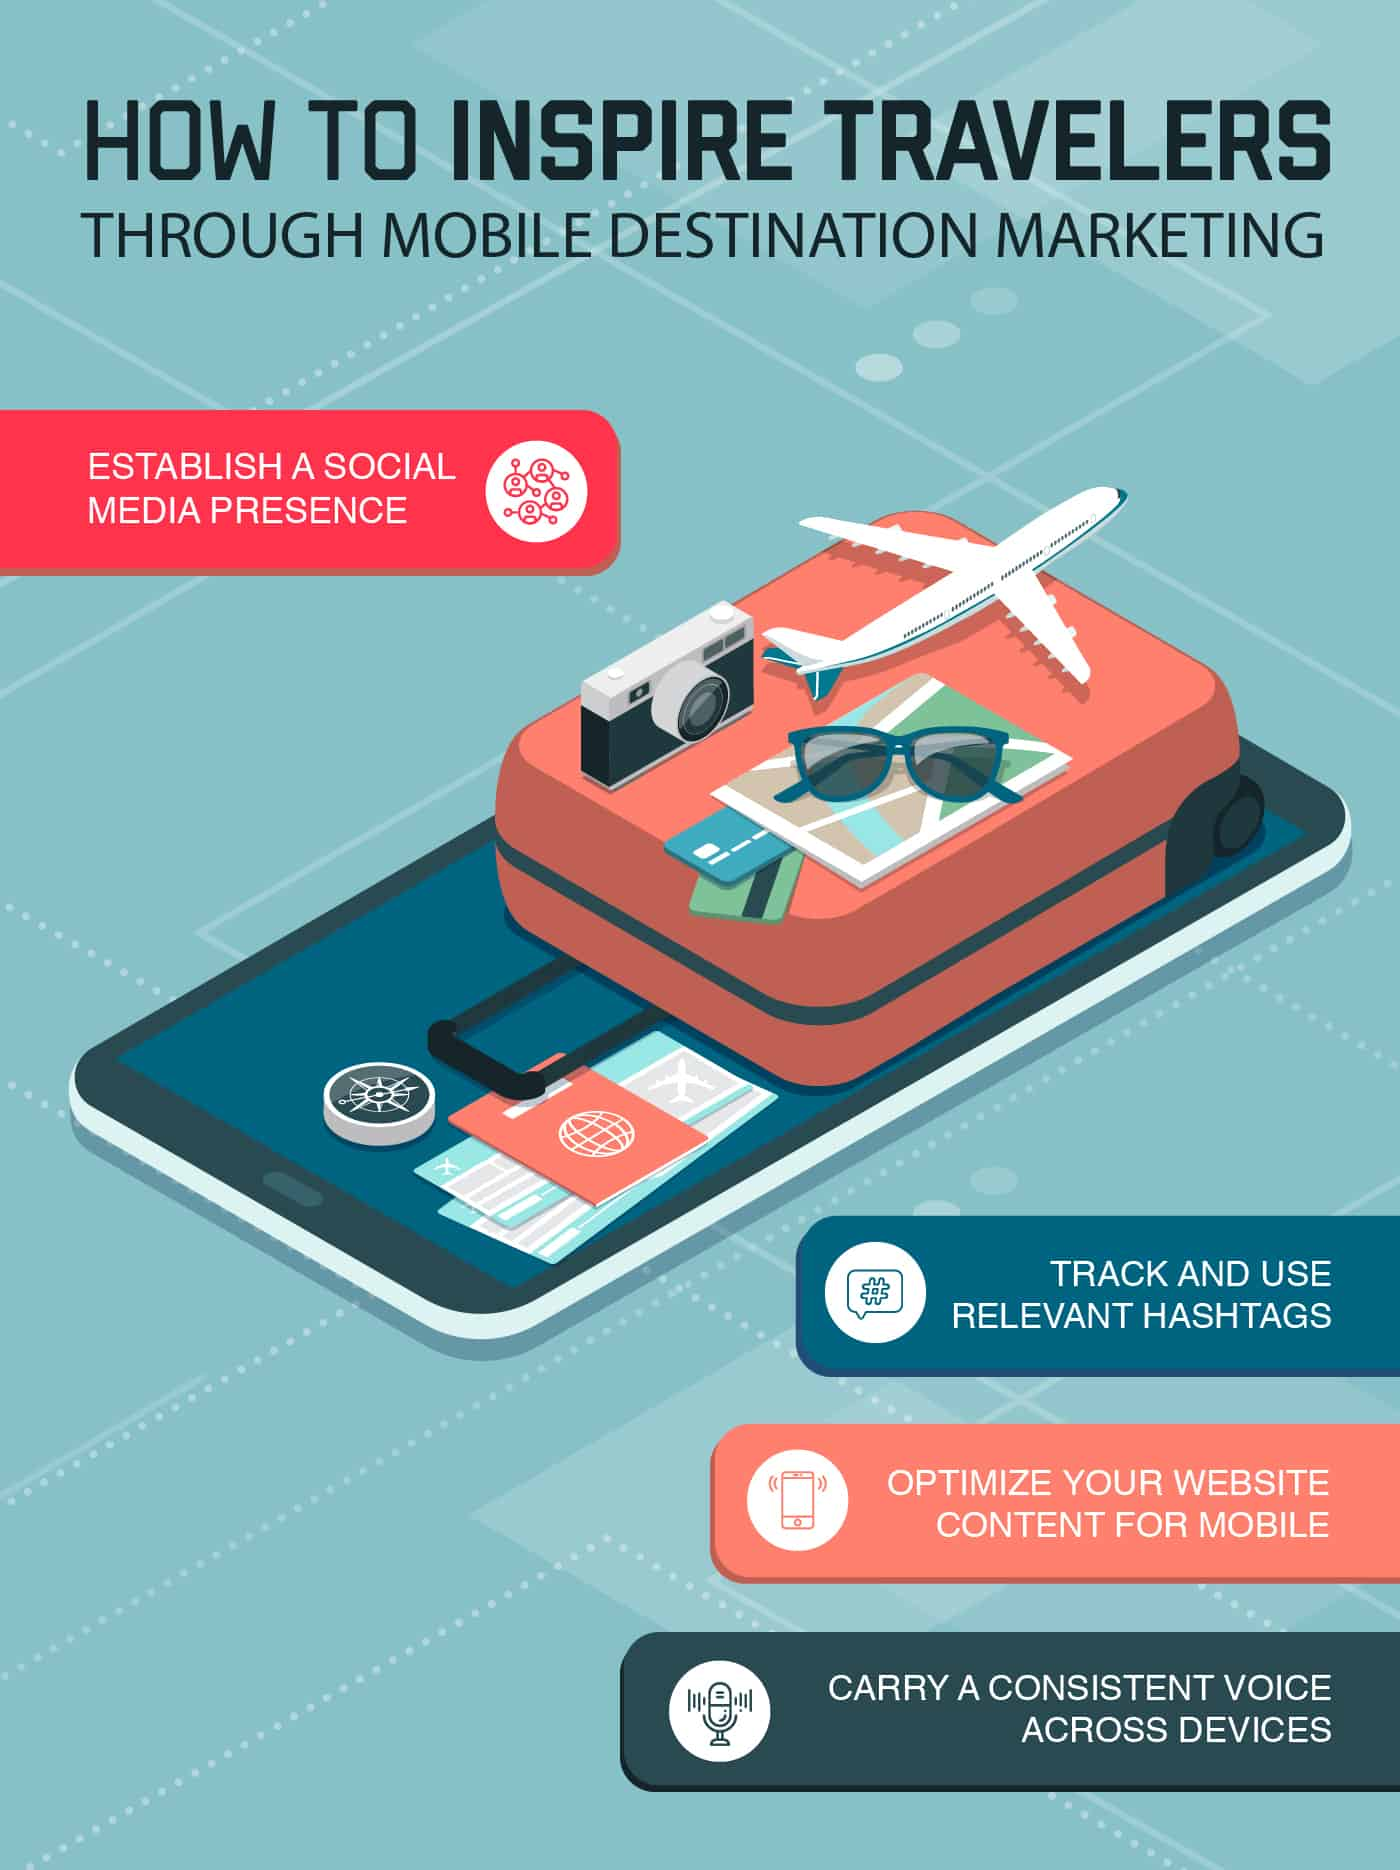 Mobile Travel Marketing